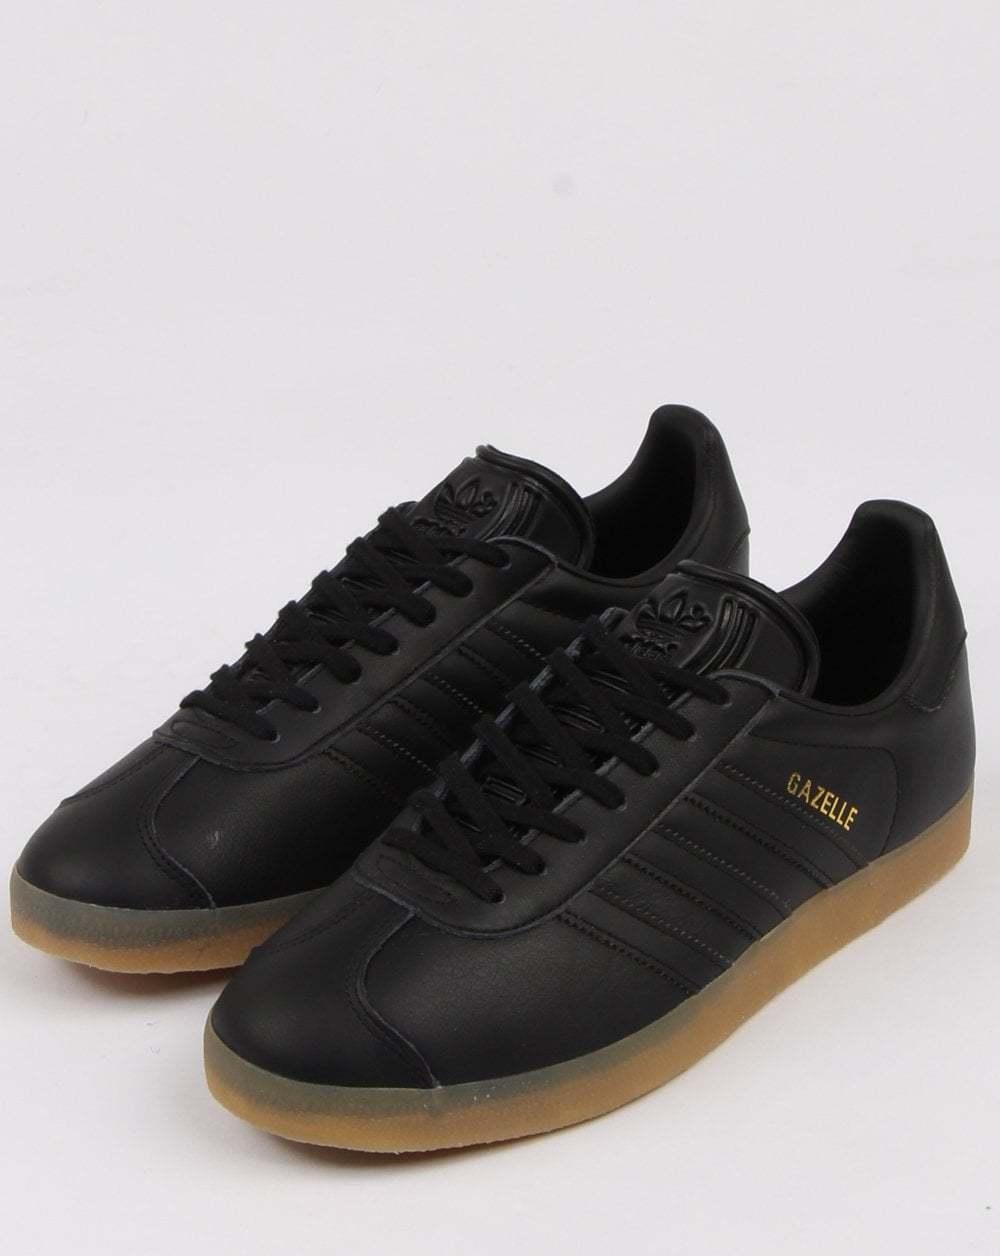 Adidas Originals Gazelle cuir cuir cuir - Noir f62c0d